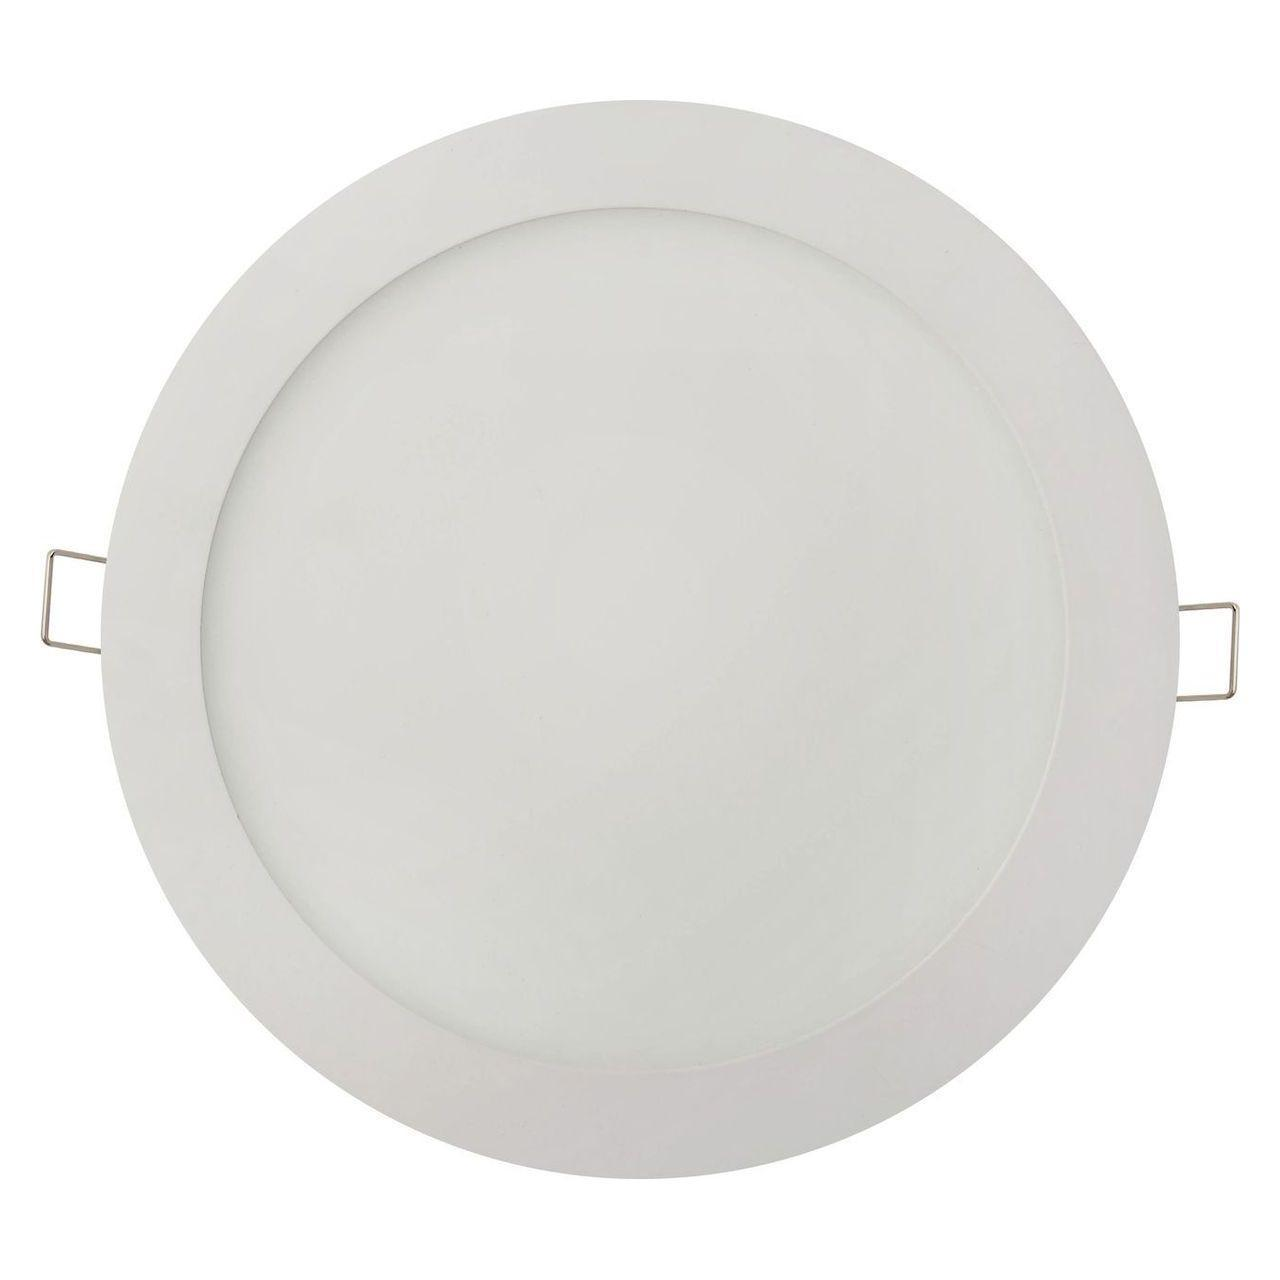 Фото - Встраиваемый светодиодный светильник Horoz Slim-18 18W 6400K 056-003-0018 resch dayton 18w 6400k 1890lm 18 led white ceiling lamp down light 185 265v